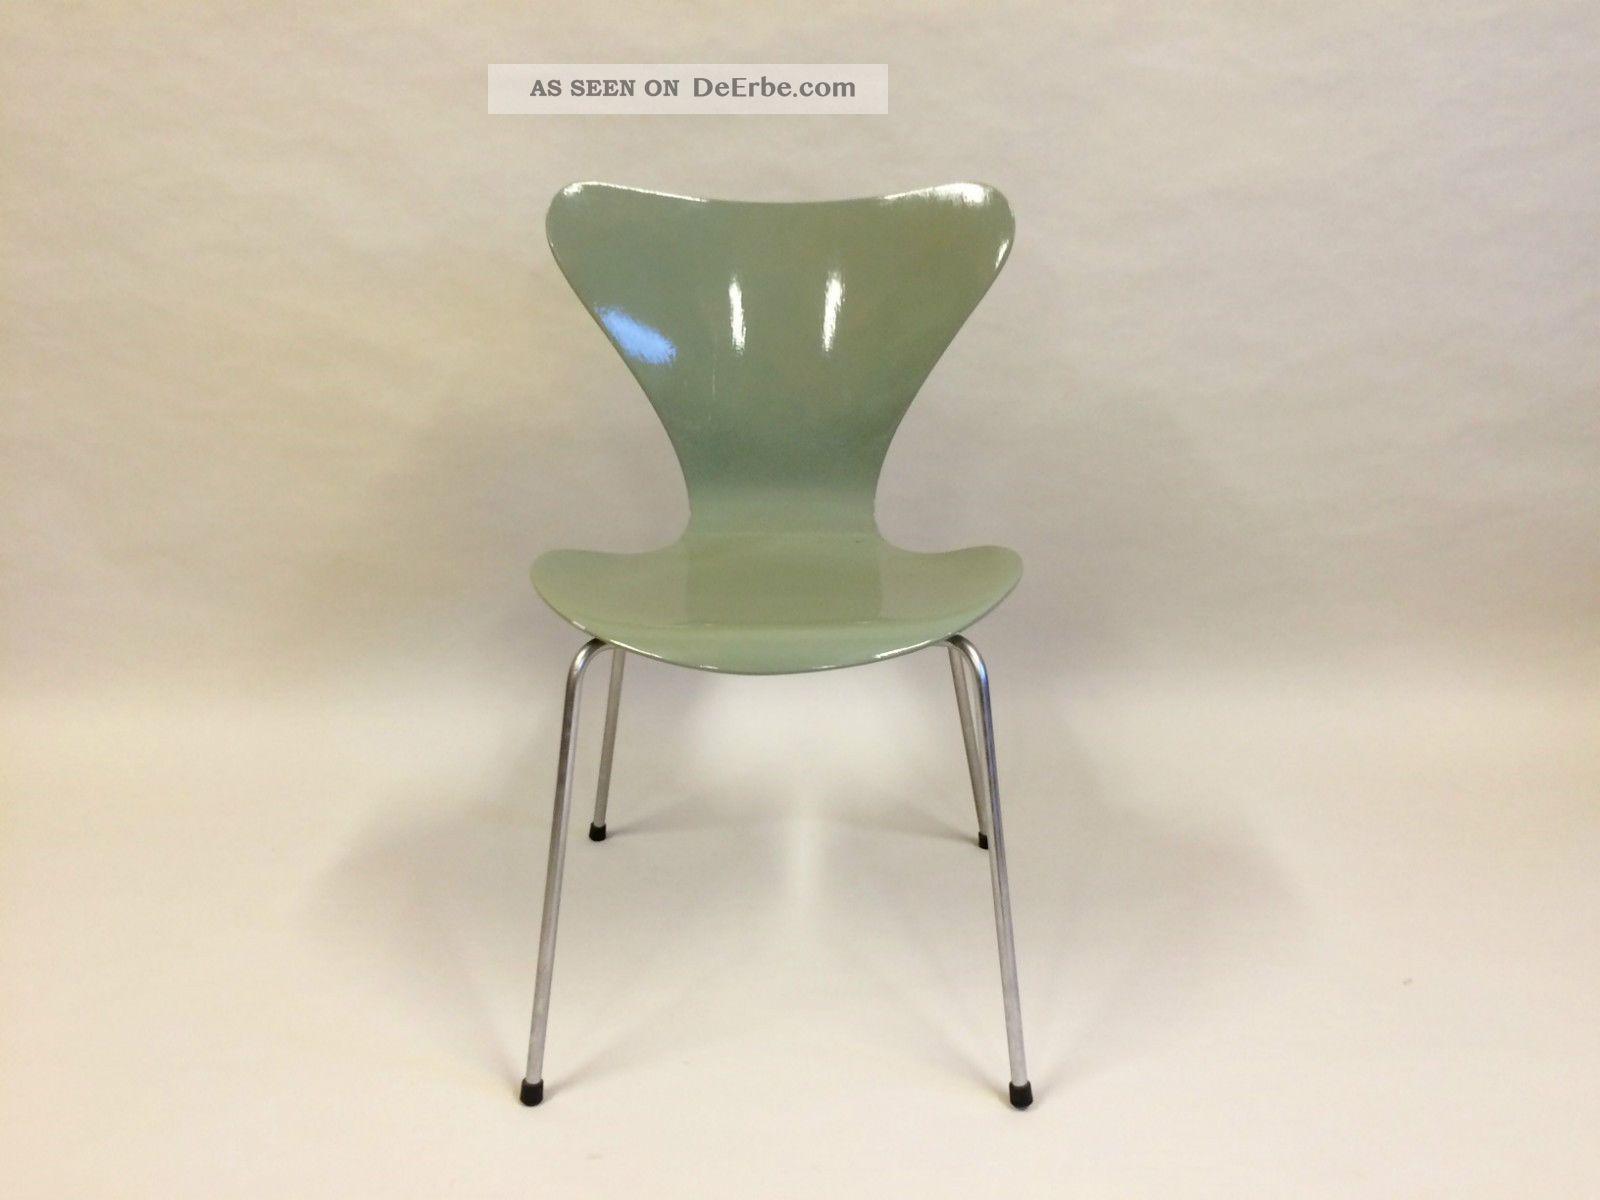 arne jacobsen 3107 stuhl fritz hansen denmark nr 2 von 2. Black Bedroom Furniture Sets. Home Design Ideas